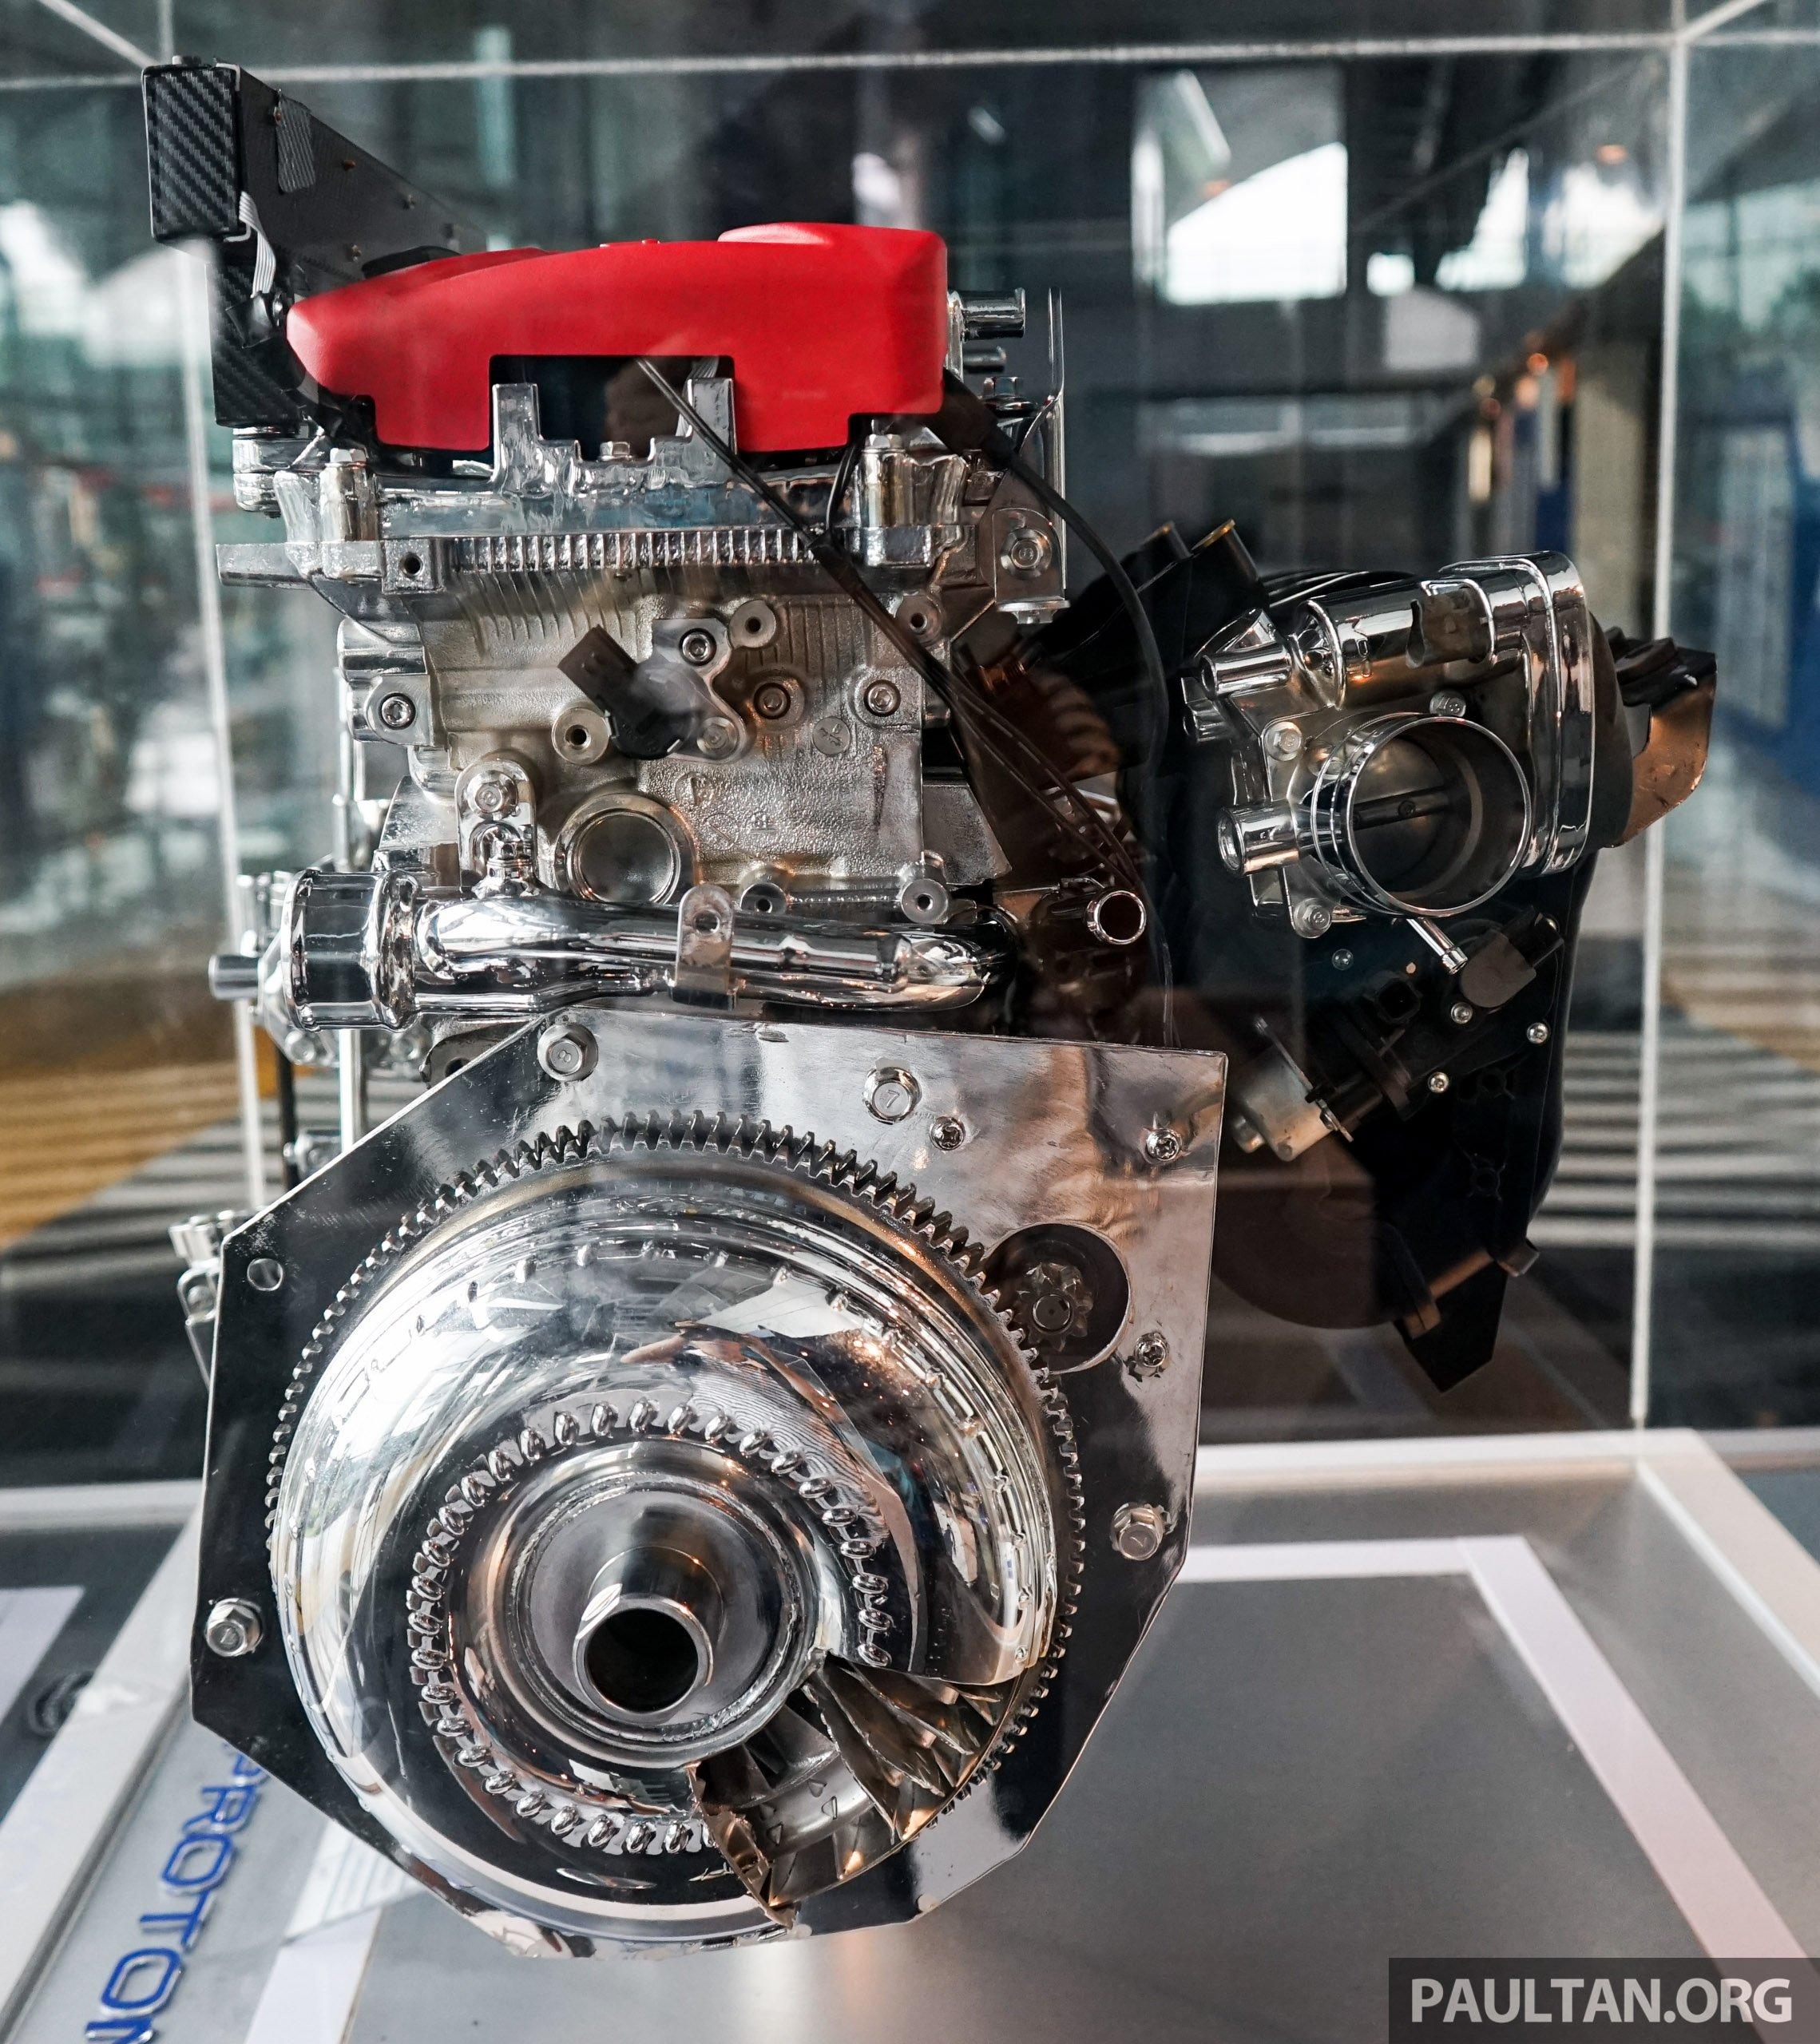 Proton Gdi Engine >> Proton new GDI and TGDI engines detailed – modular design, higher compression ratio, future ...